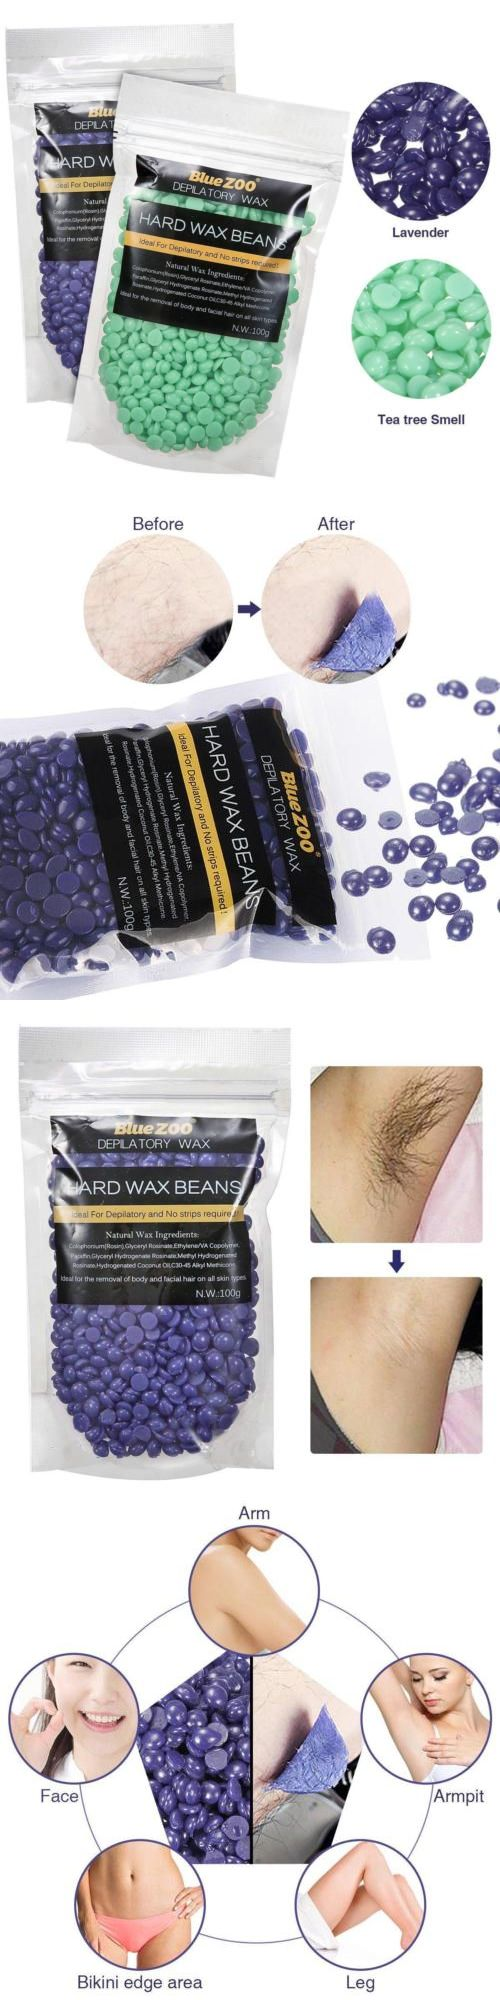 Waxing Supplies: Hair Removal Hard Wax Bean, Luckyfine Depilatory Lavender Tea Tree Full Body... -> BUY IT NOW ONLY: $37.44 on eBay!